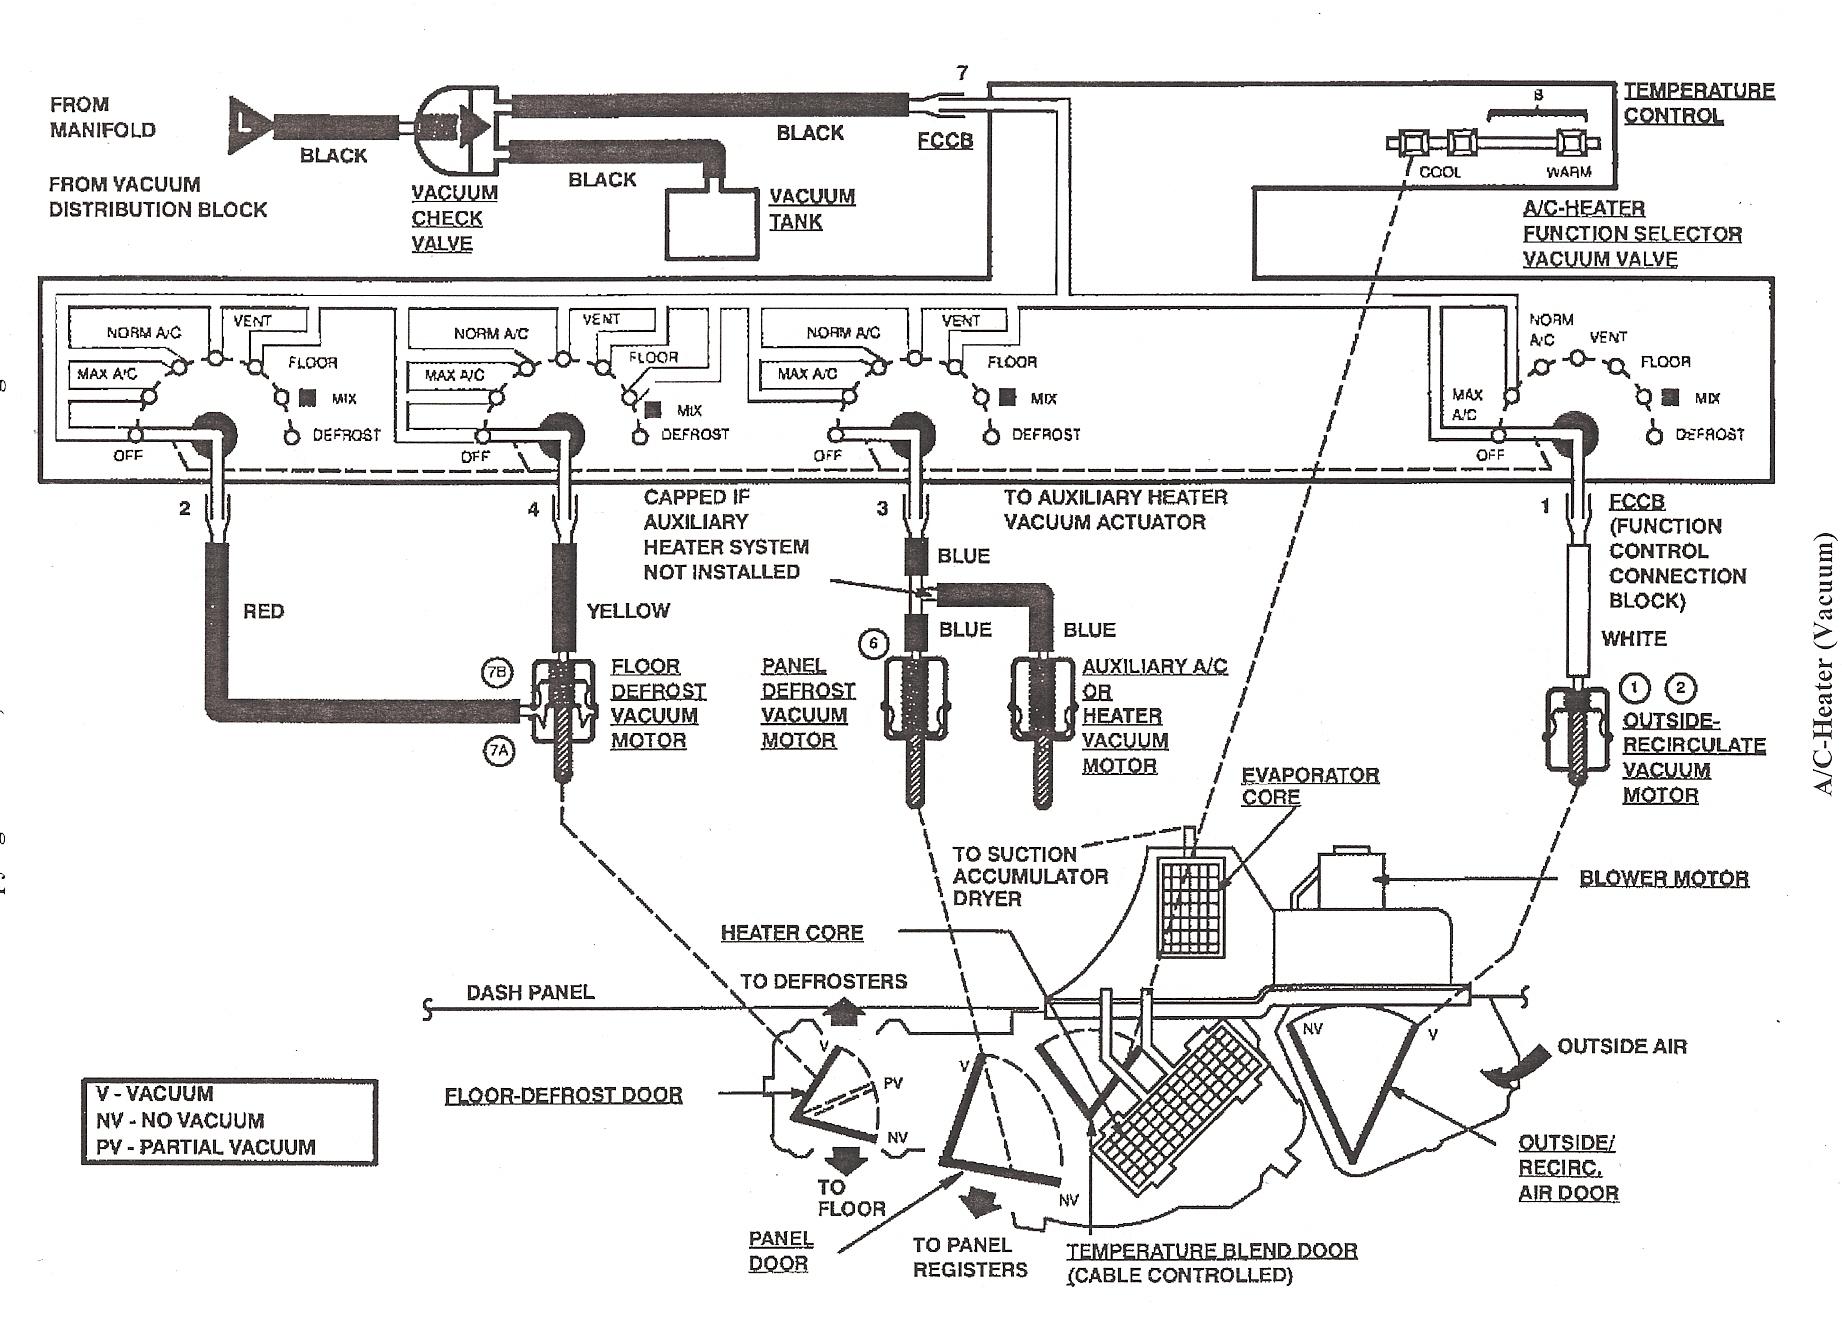 2013 Ford Edge Engine Vacuum Diagrams • Wiring Diagram For